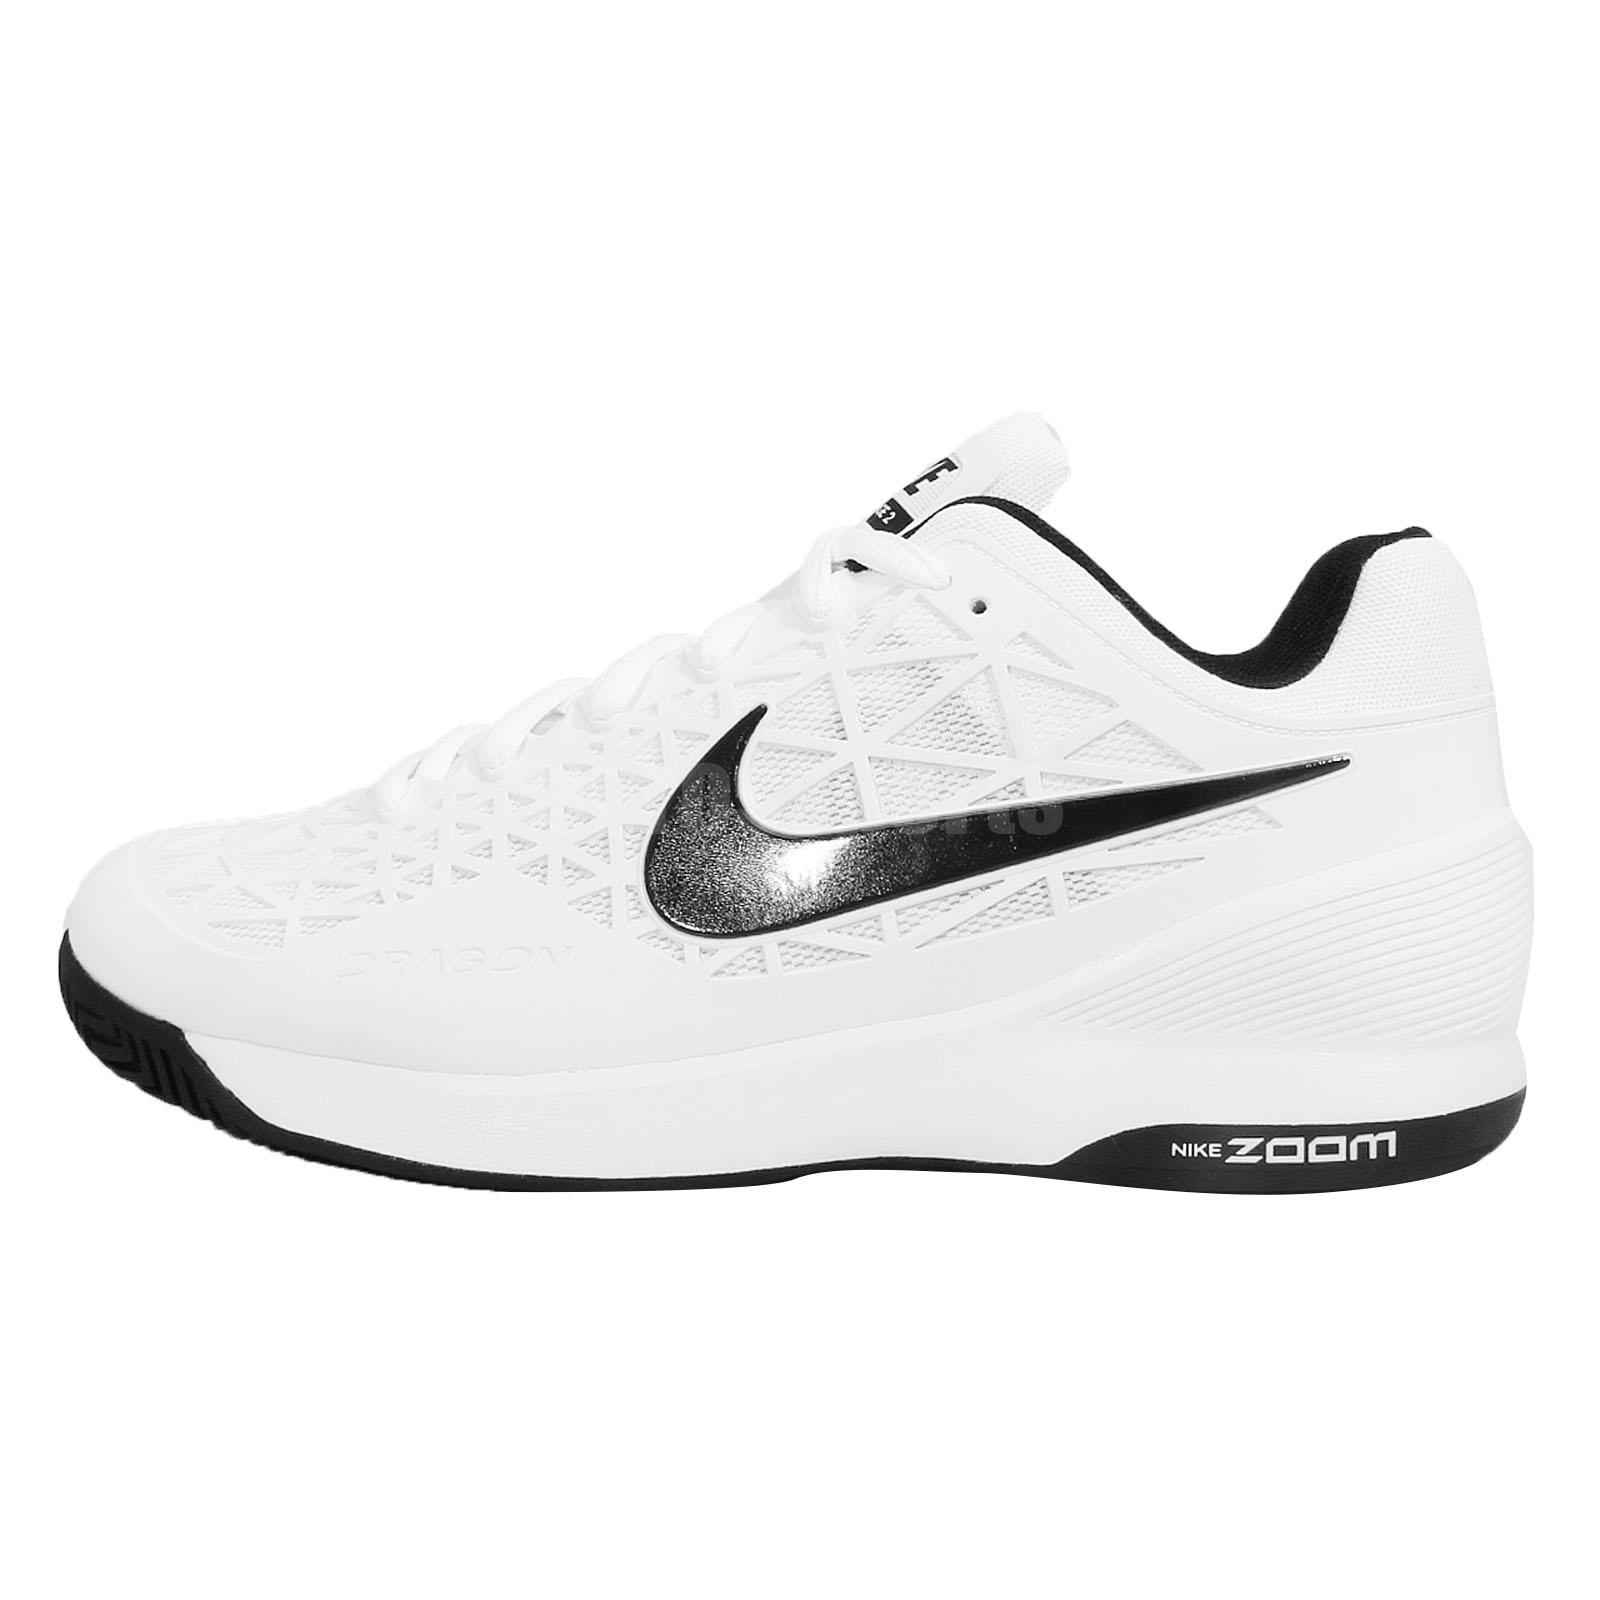 nike zoom cage 2 white black 2015 mens tennis shoes